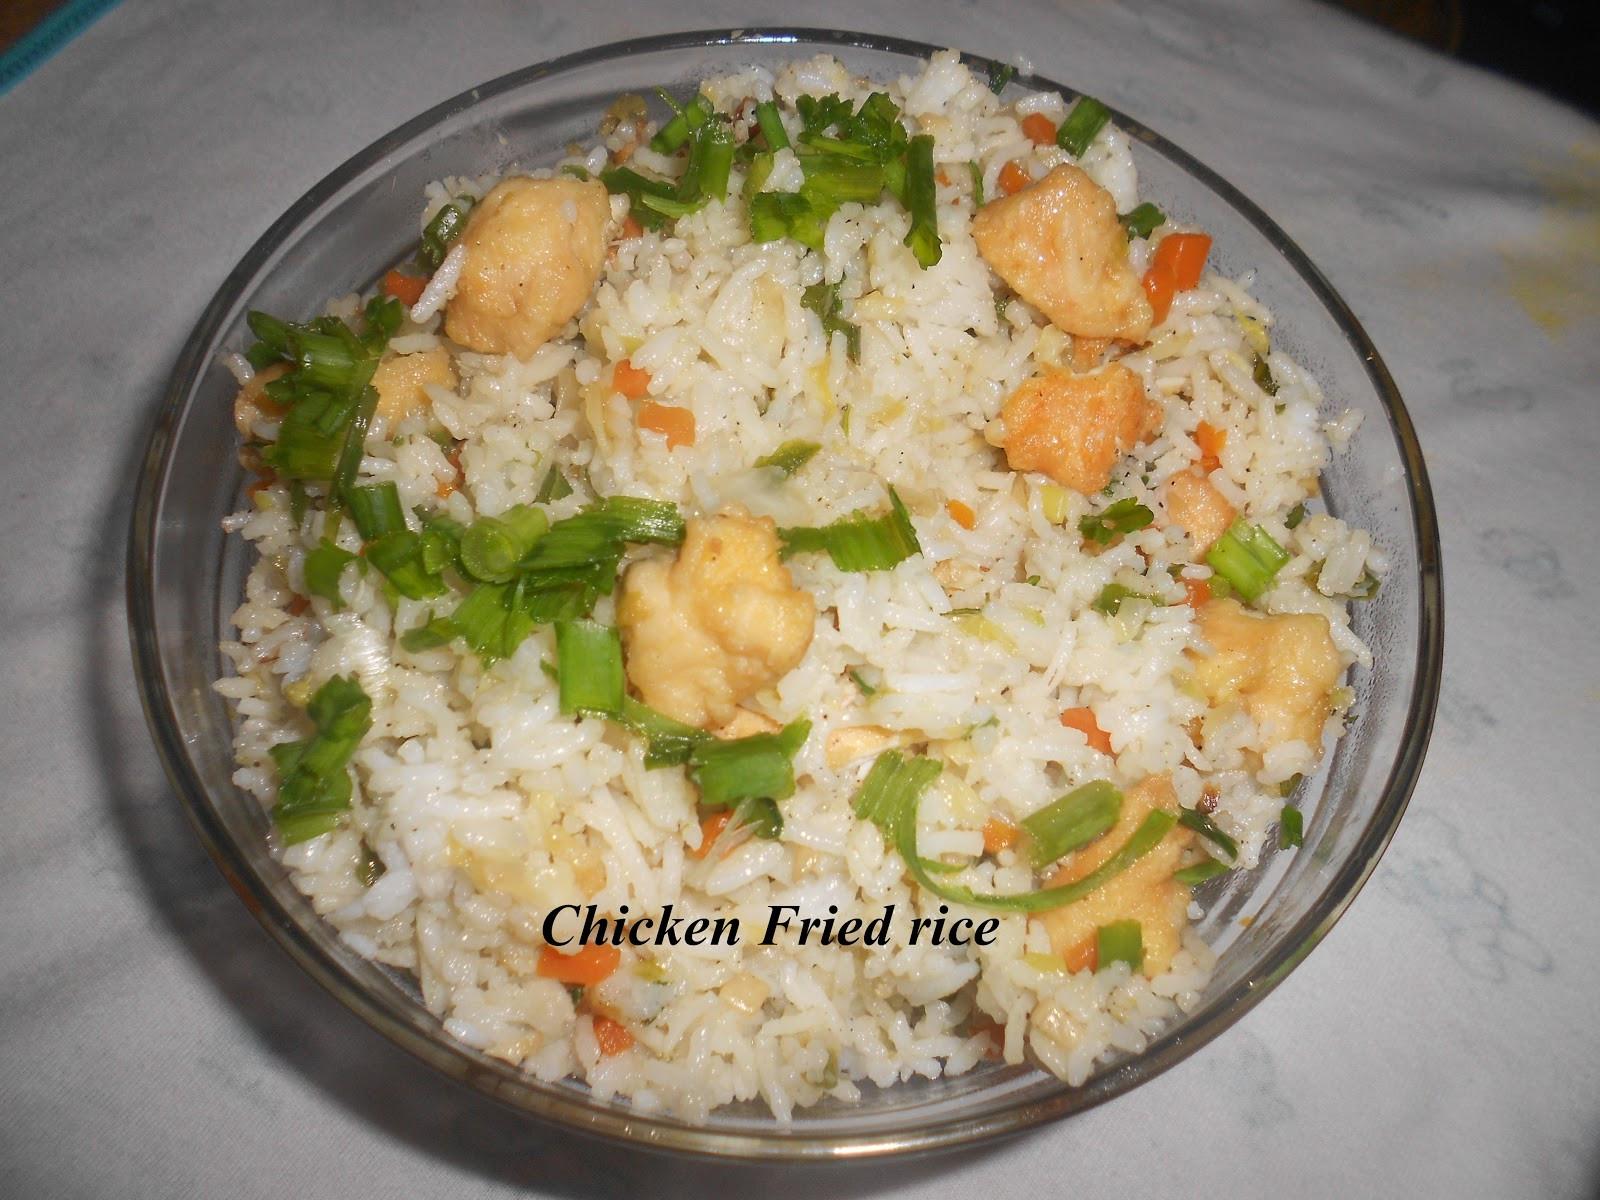 Chinese Fried Chicken  Jiya s Delicacy Chicken fried rice